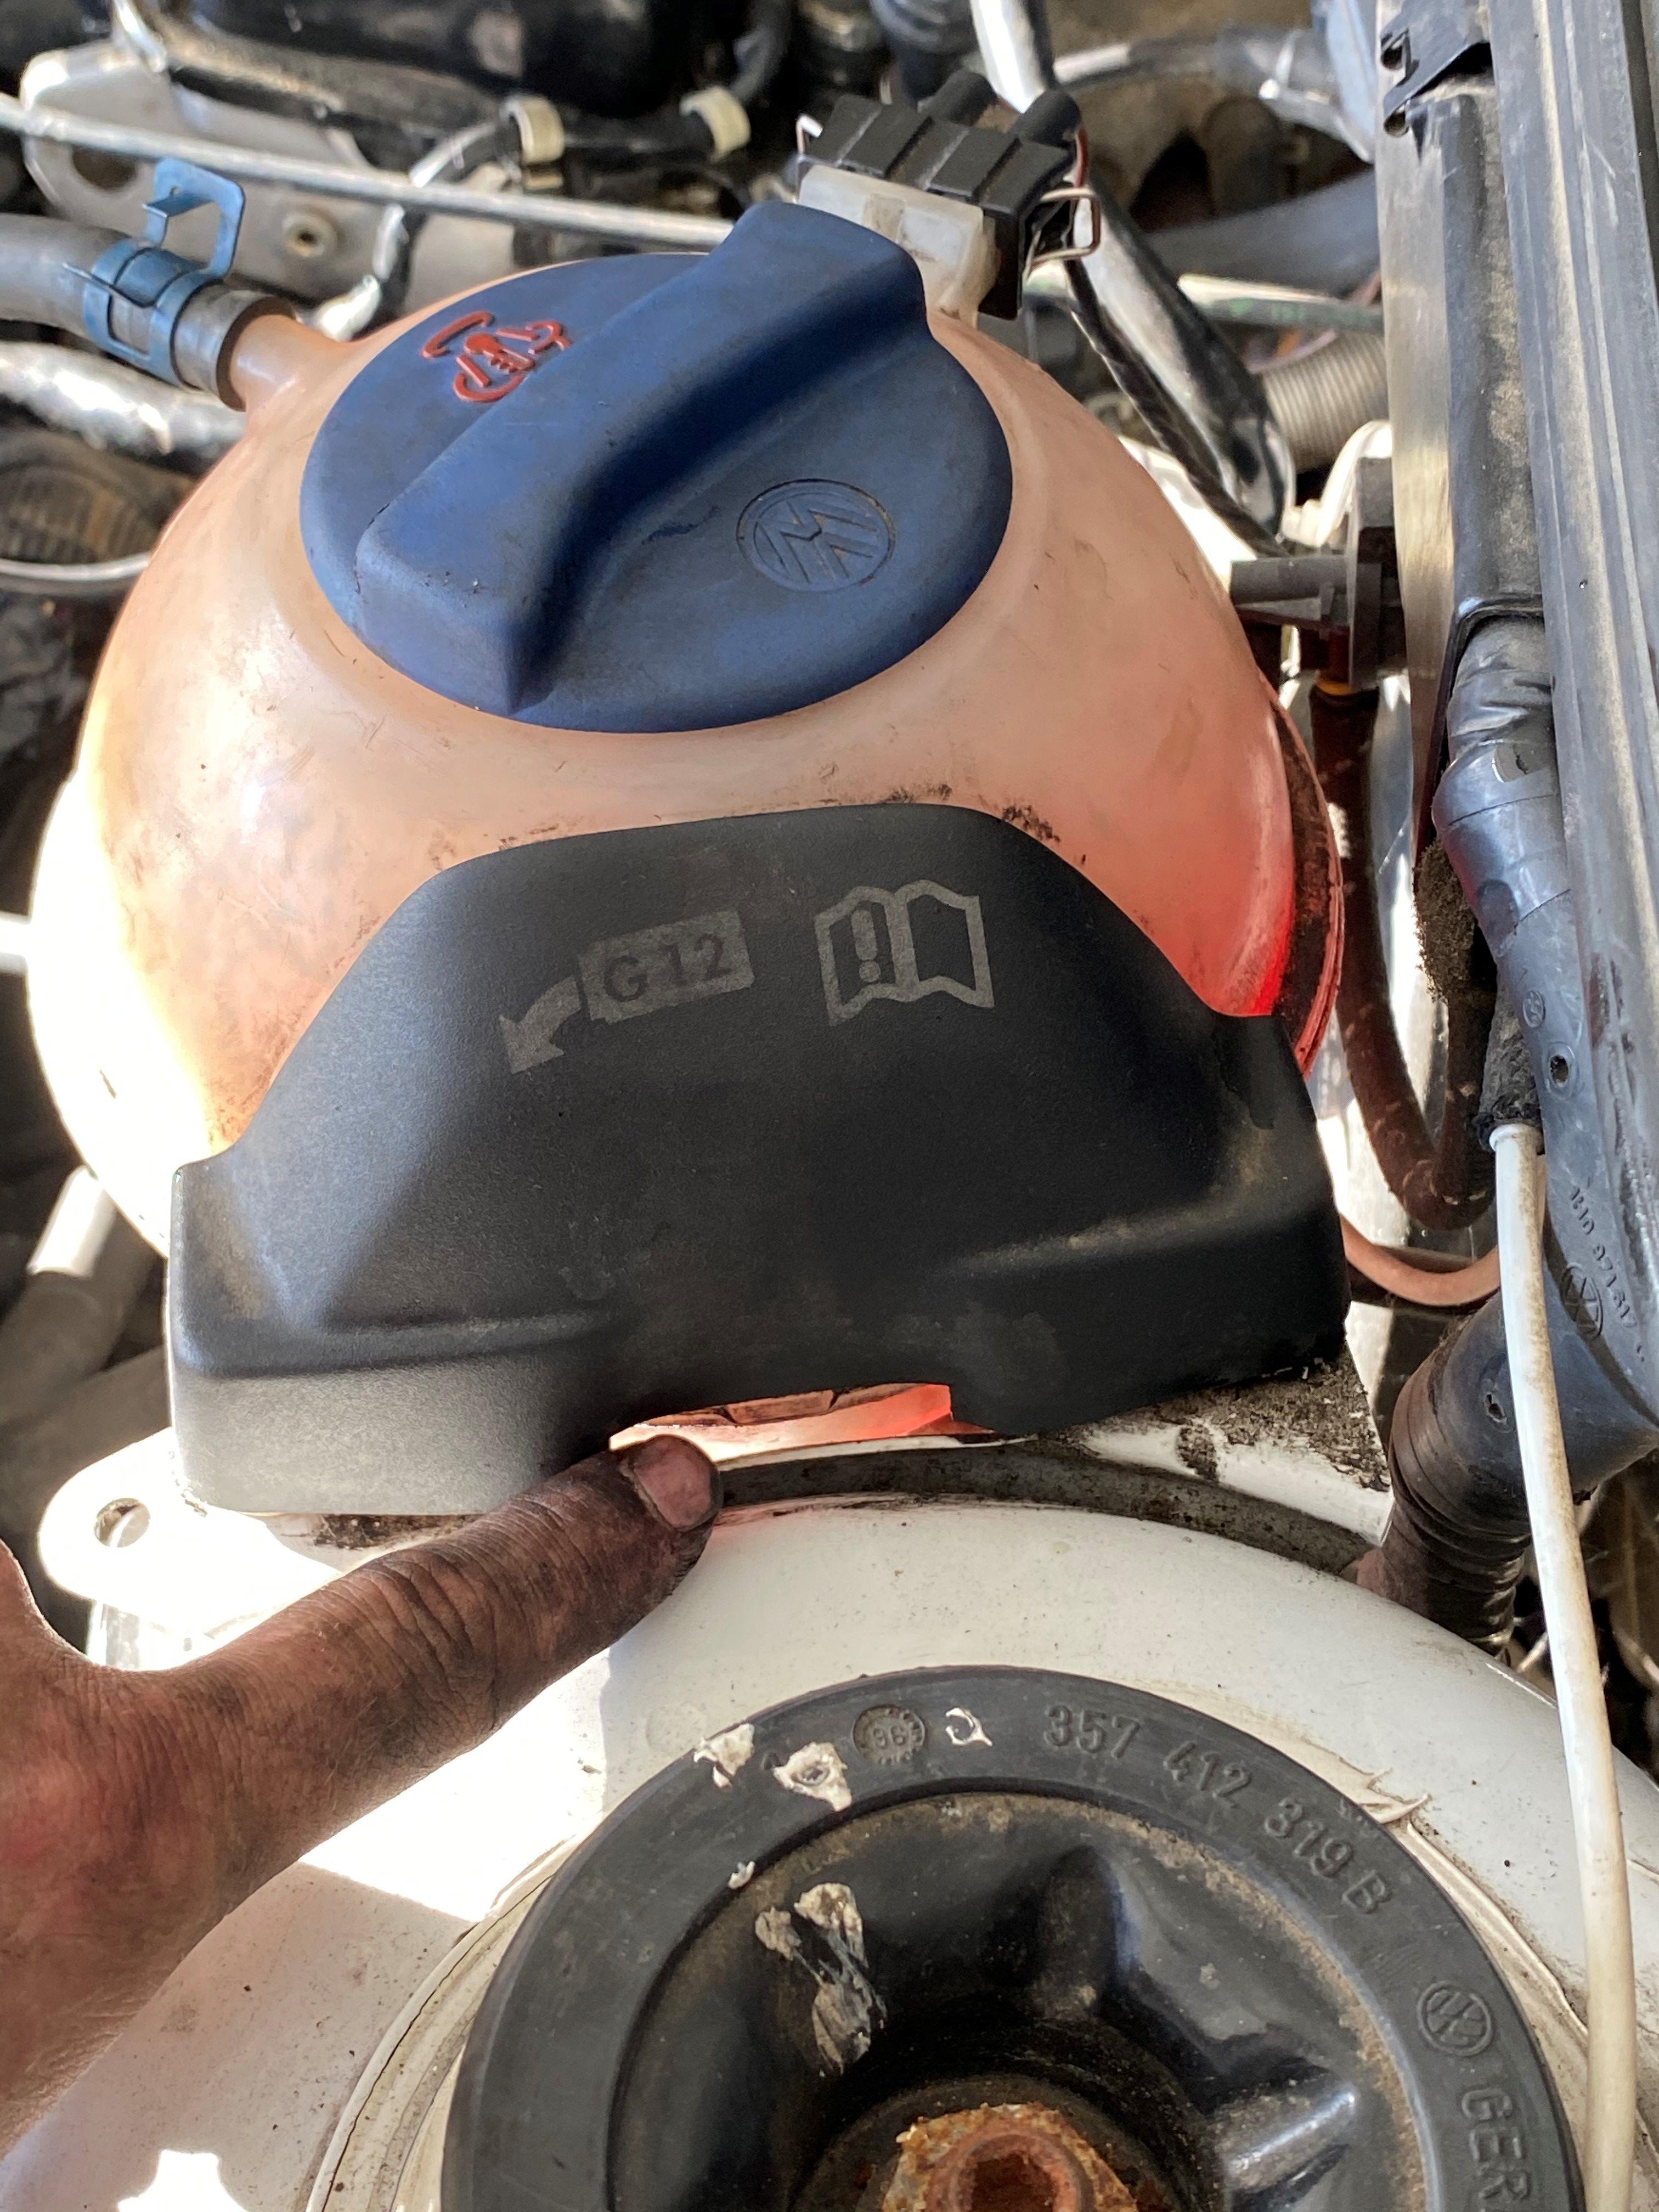 [ Volkswagen Golf III 1.8 90cv an 1996 ] Problème enclenchement ventilateur refroidissement (Résolu) Cs8Ttl